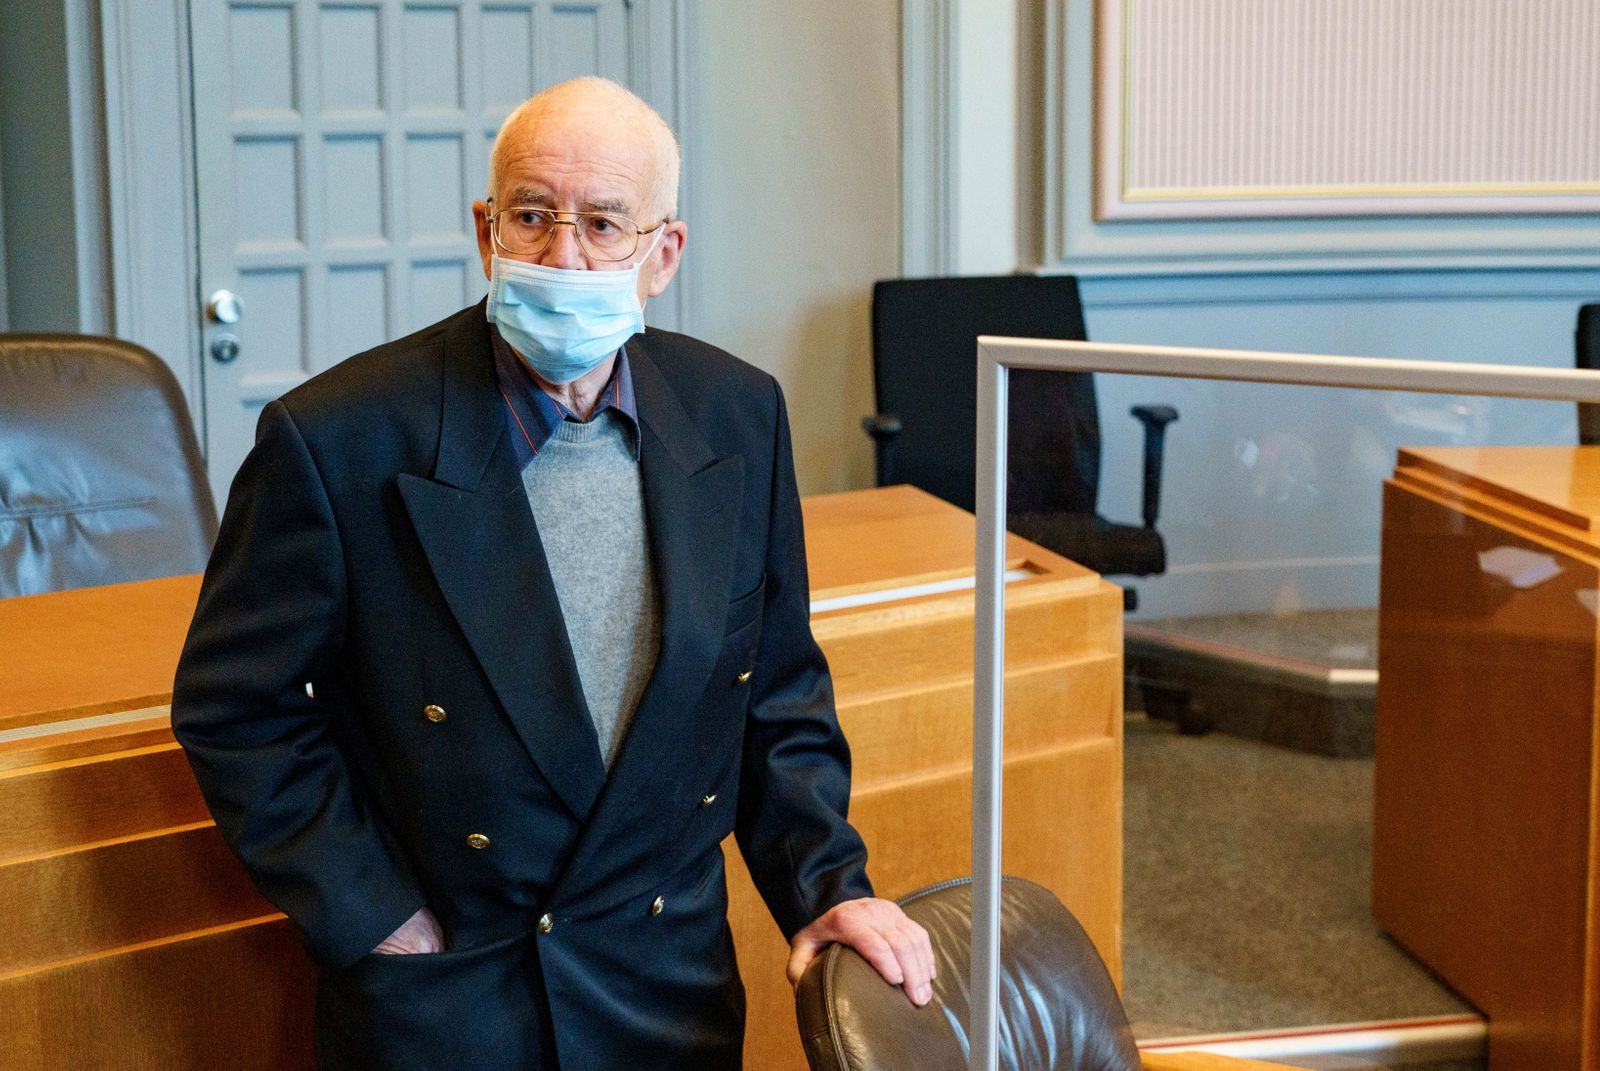 Prozess gegen 84-Jährigen wegen Besitzes eines Panzers